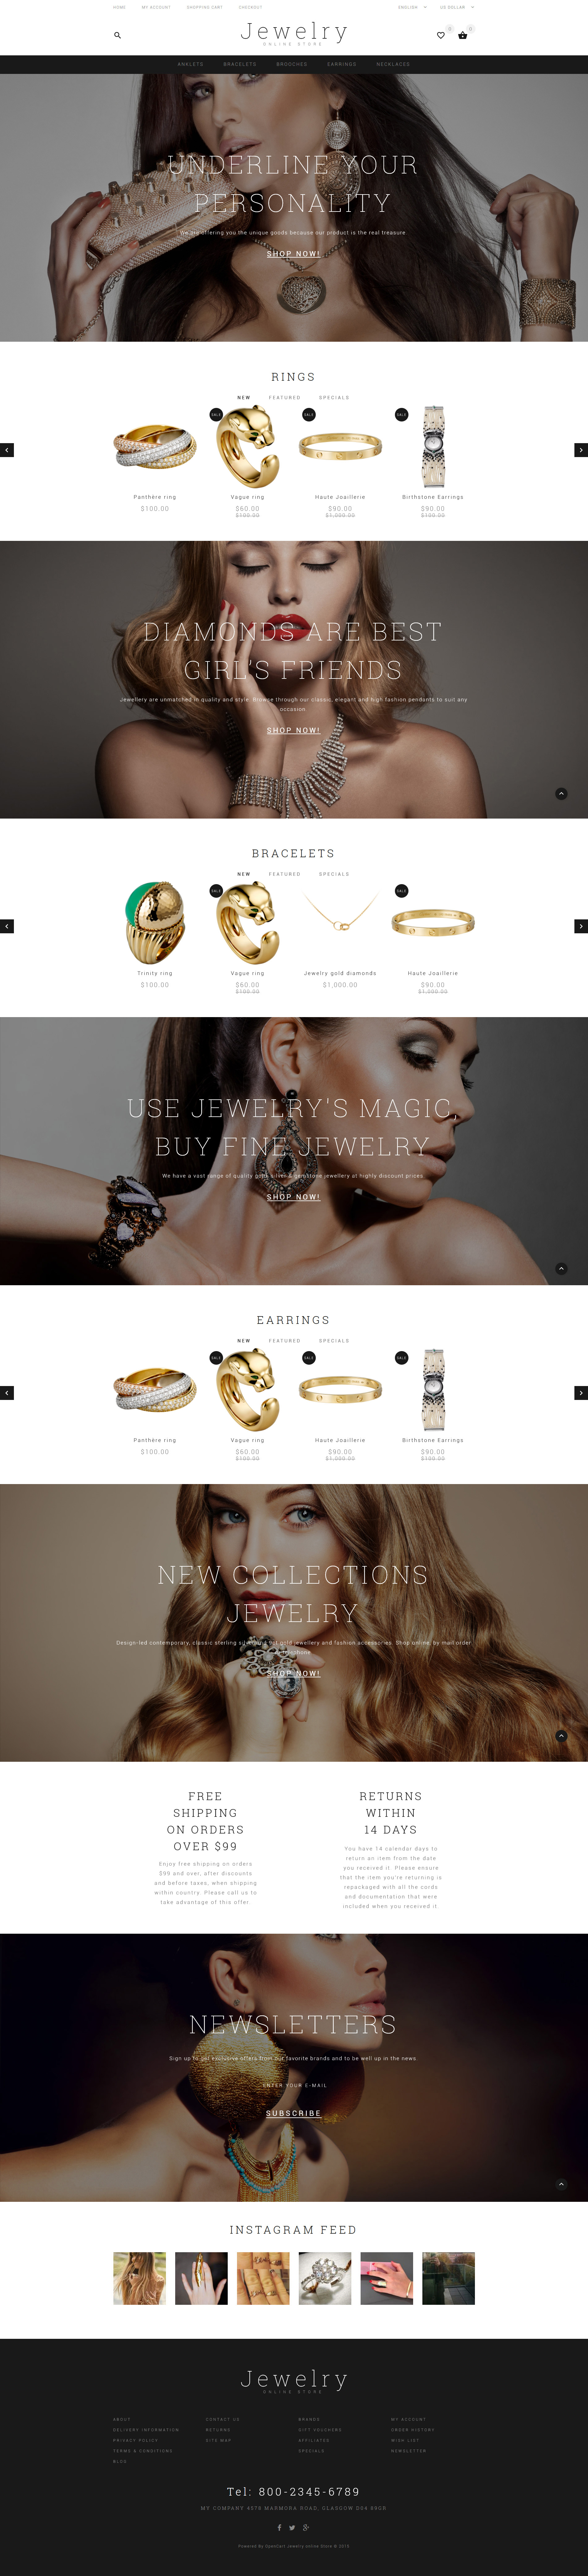 Responsive Jewelry Showcase Opencart #55818